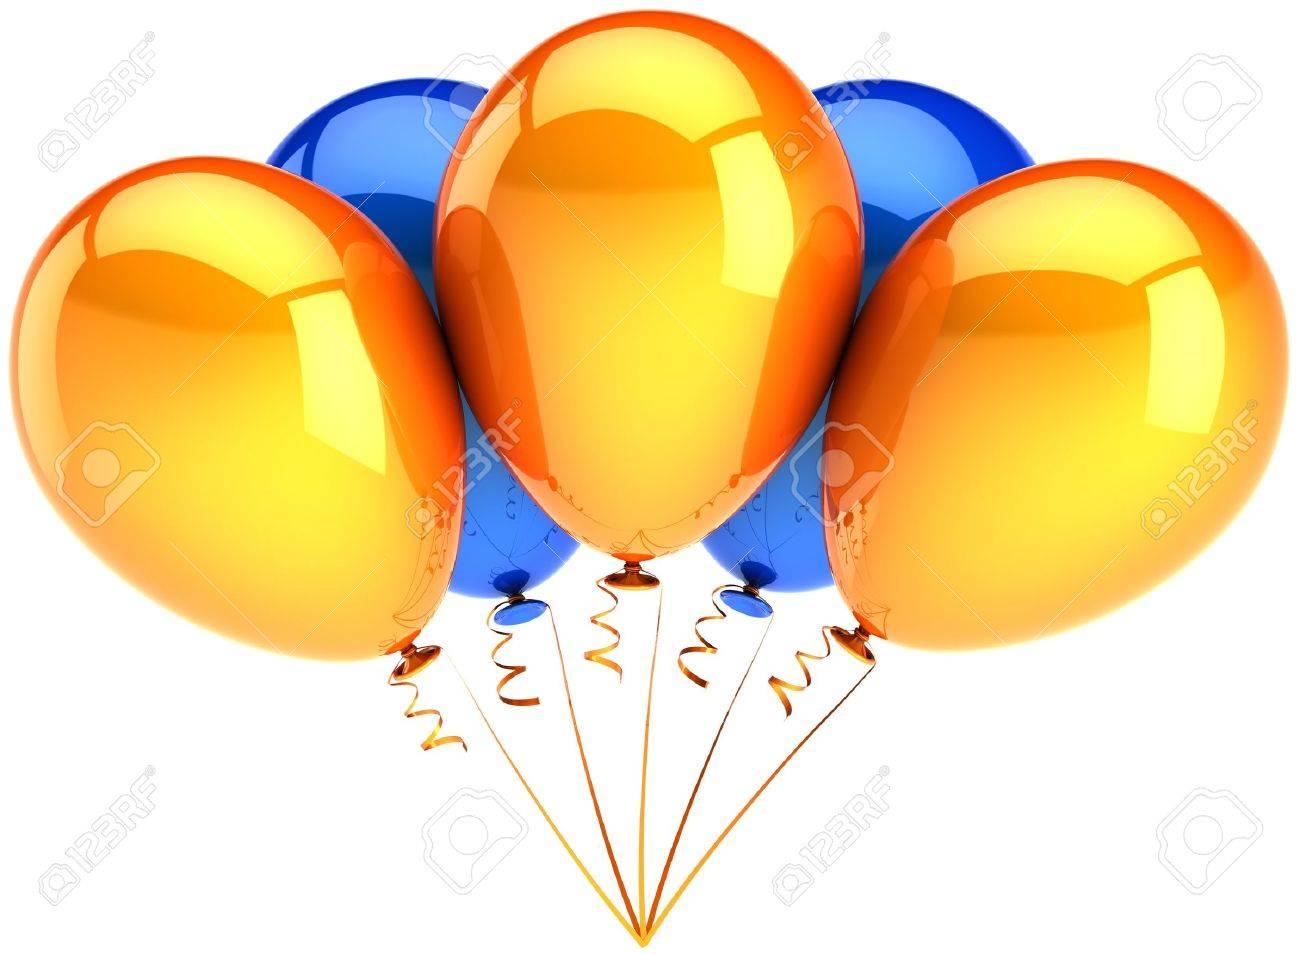 Party balloons orange blue multicolor. Five contemporary shiny decoration  for birthday holiday celebration. Joyful